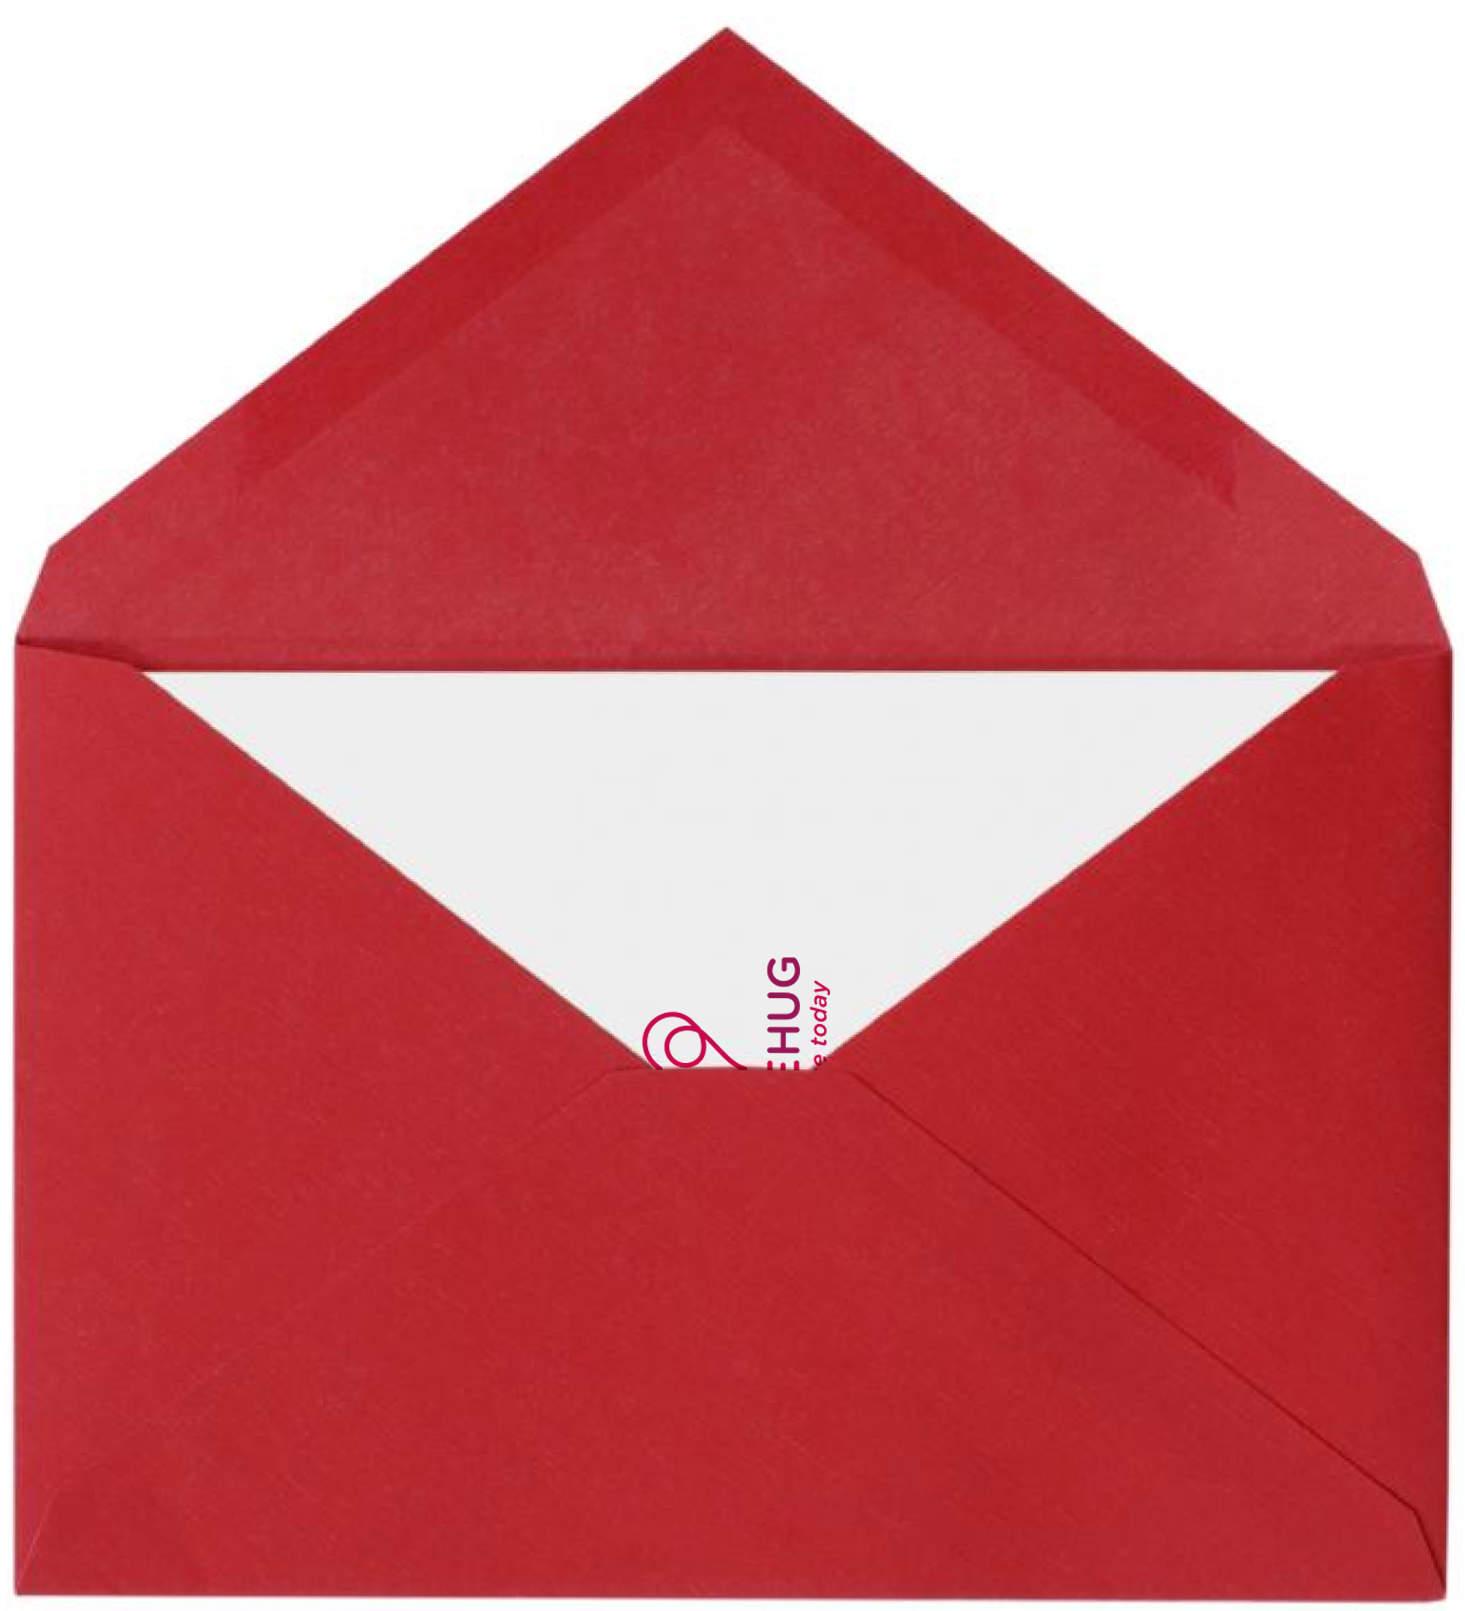 LoveHug envelope designed by imjustcreative